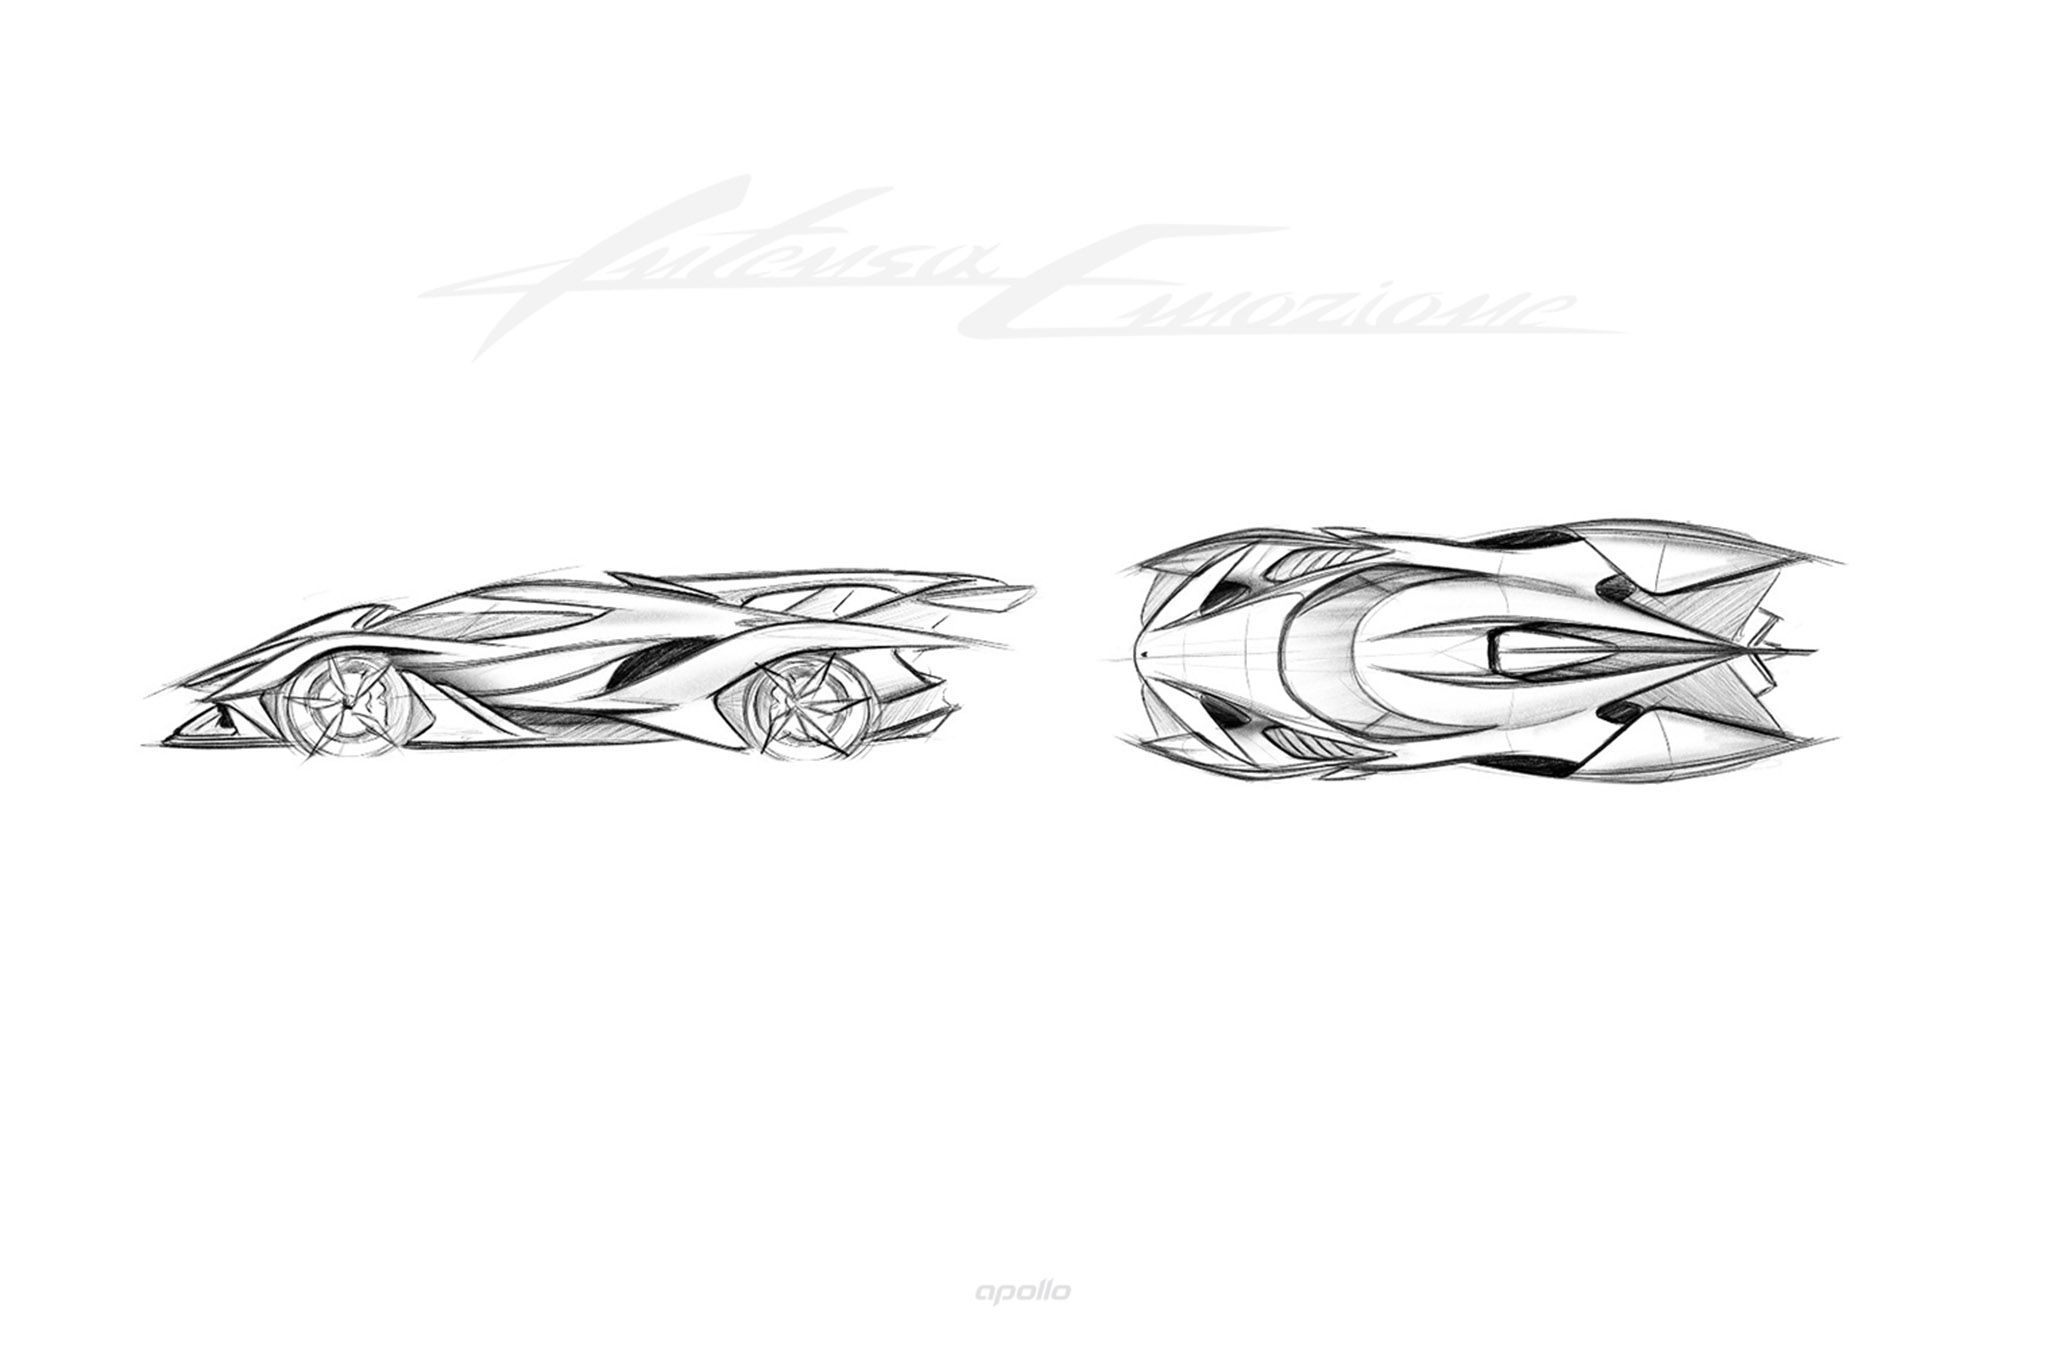 Pin By Gaurav Sadanand On Automotive Design